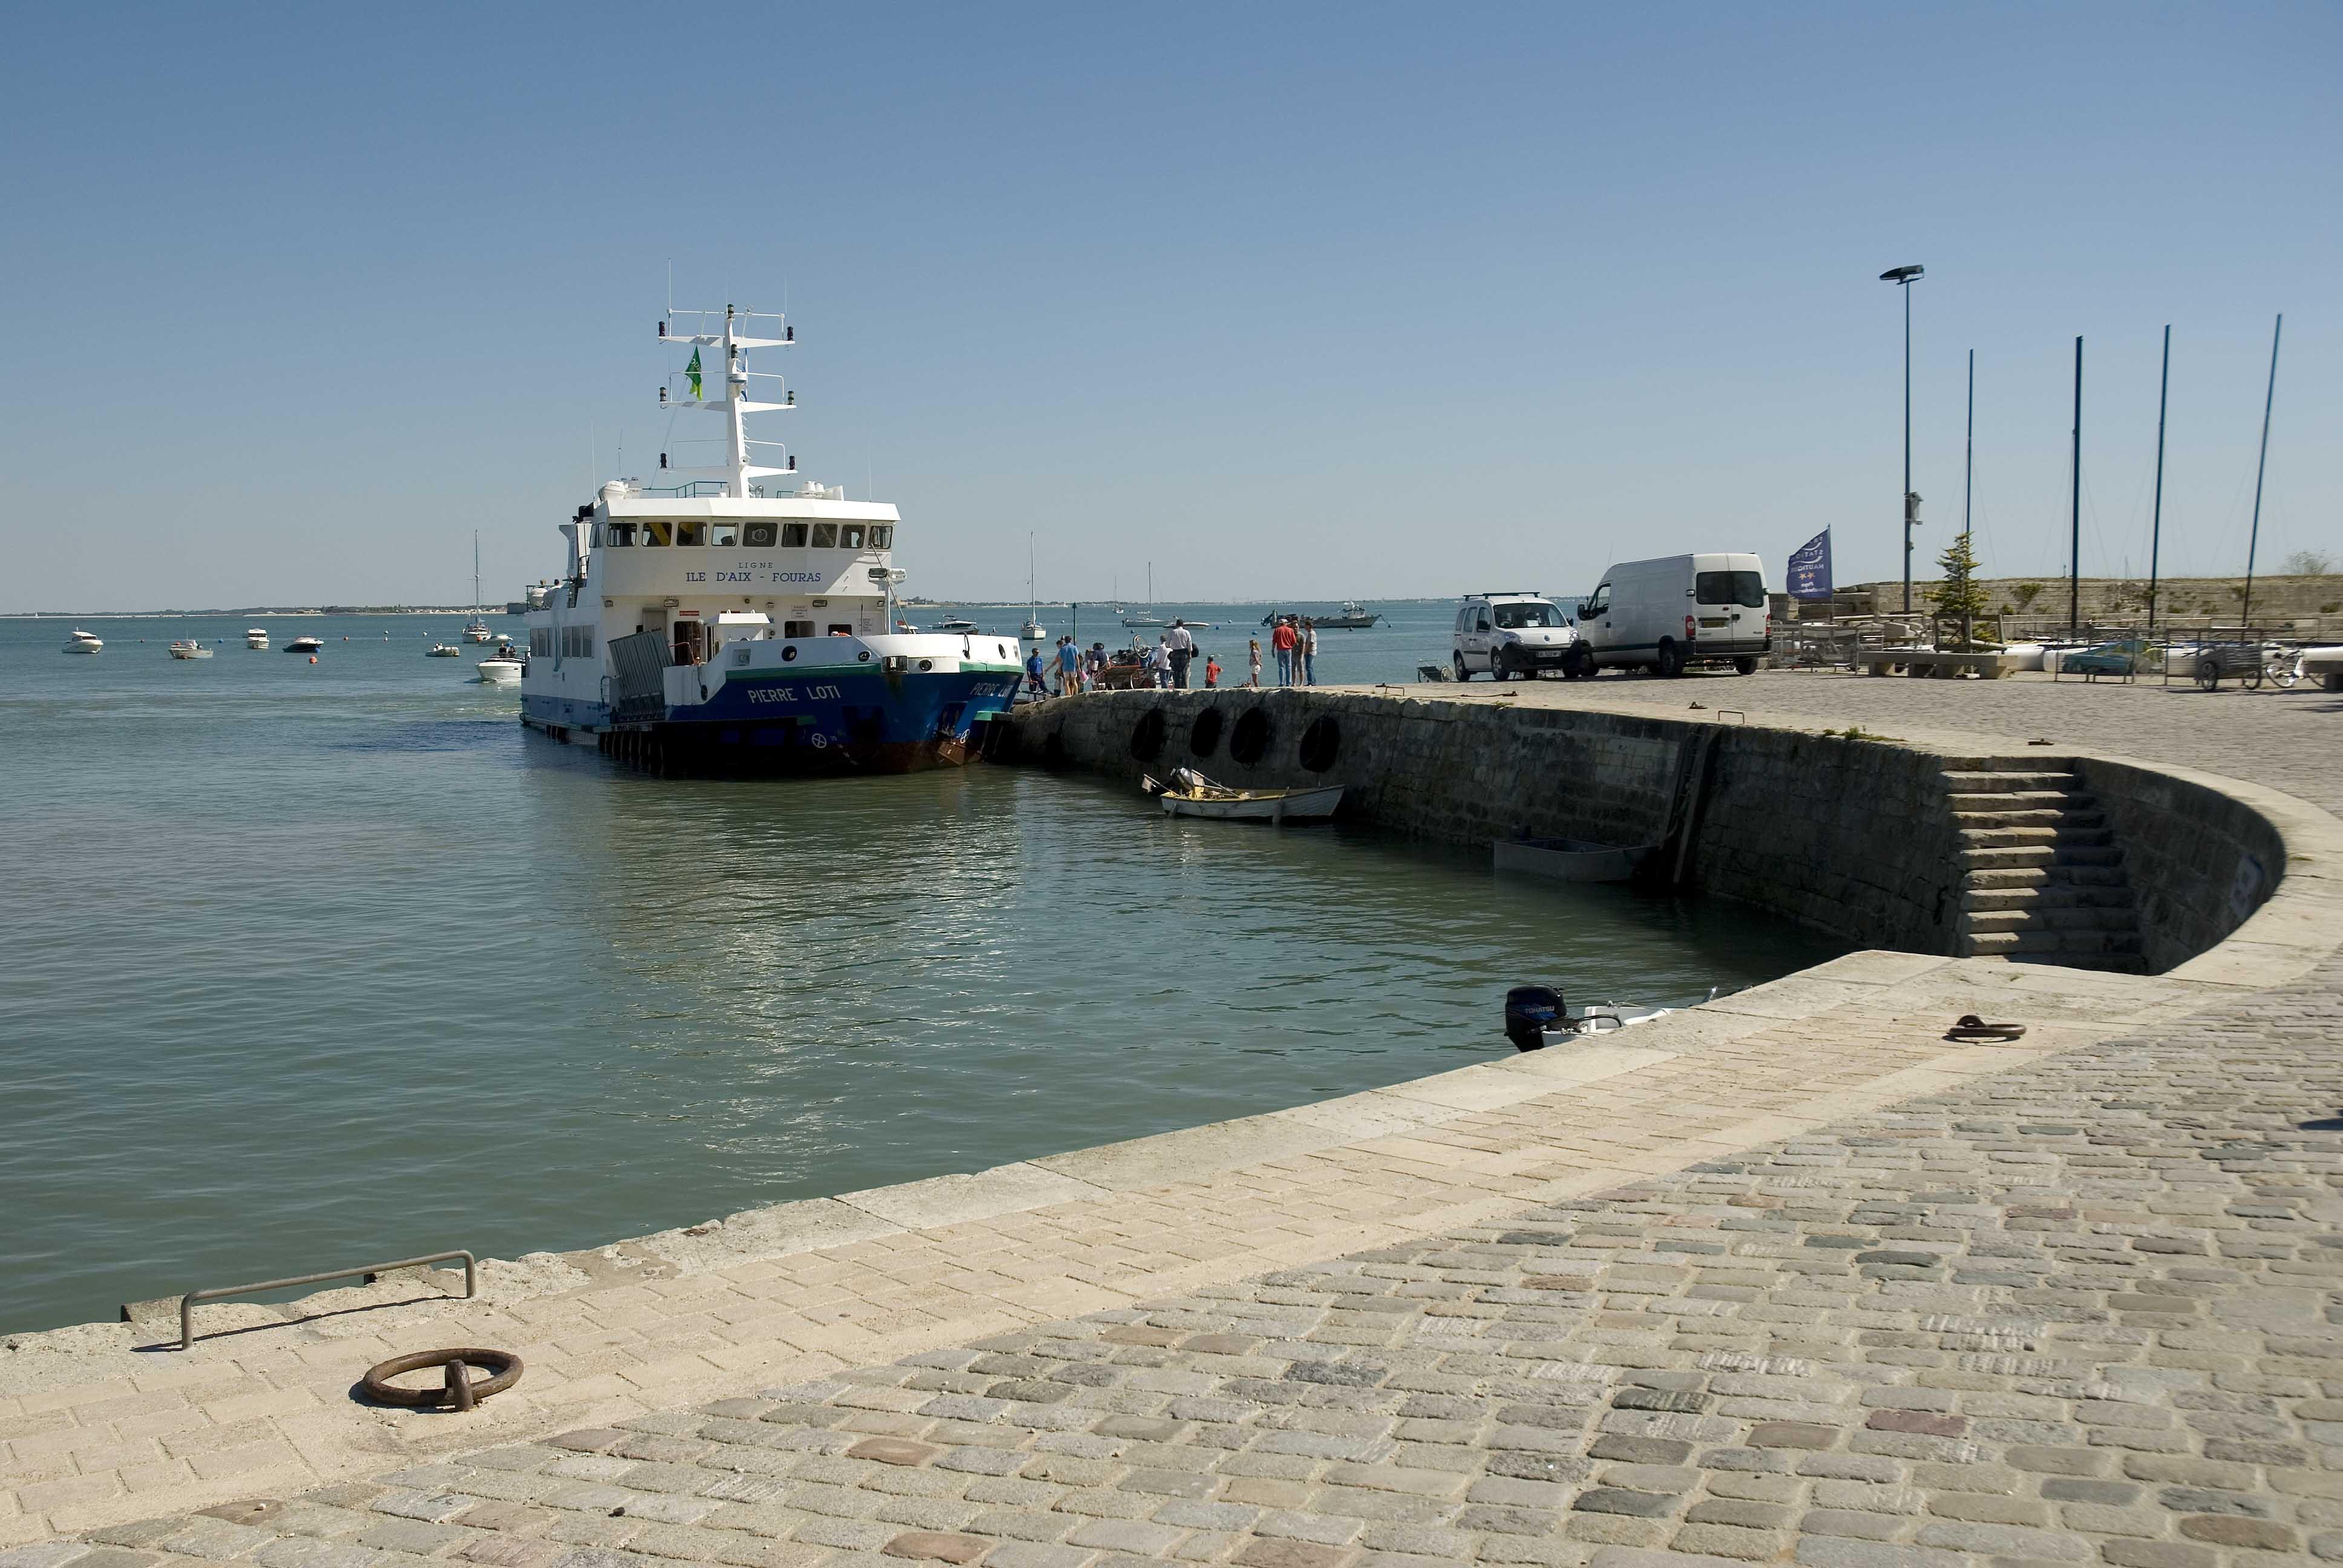 _JF13614-Ile d'AIX